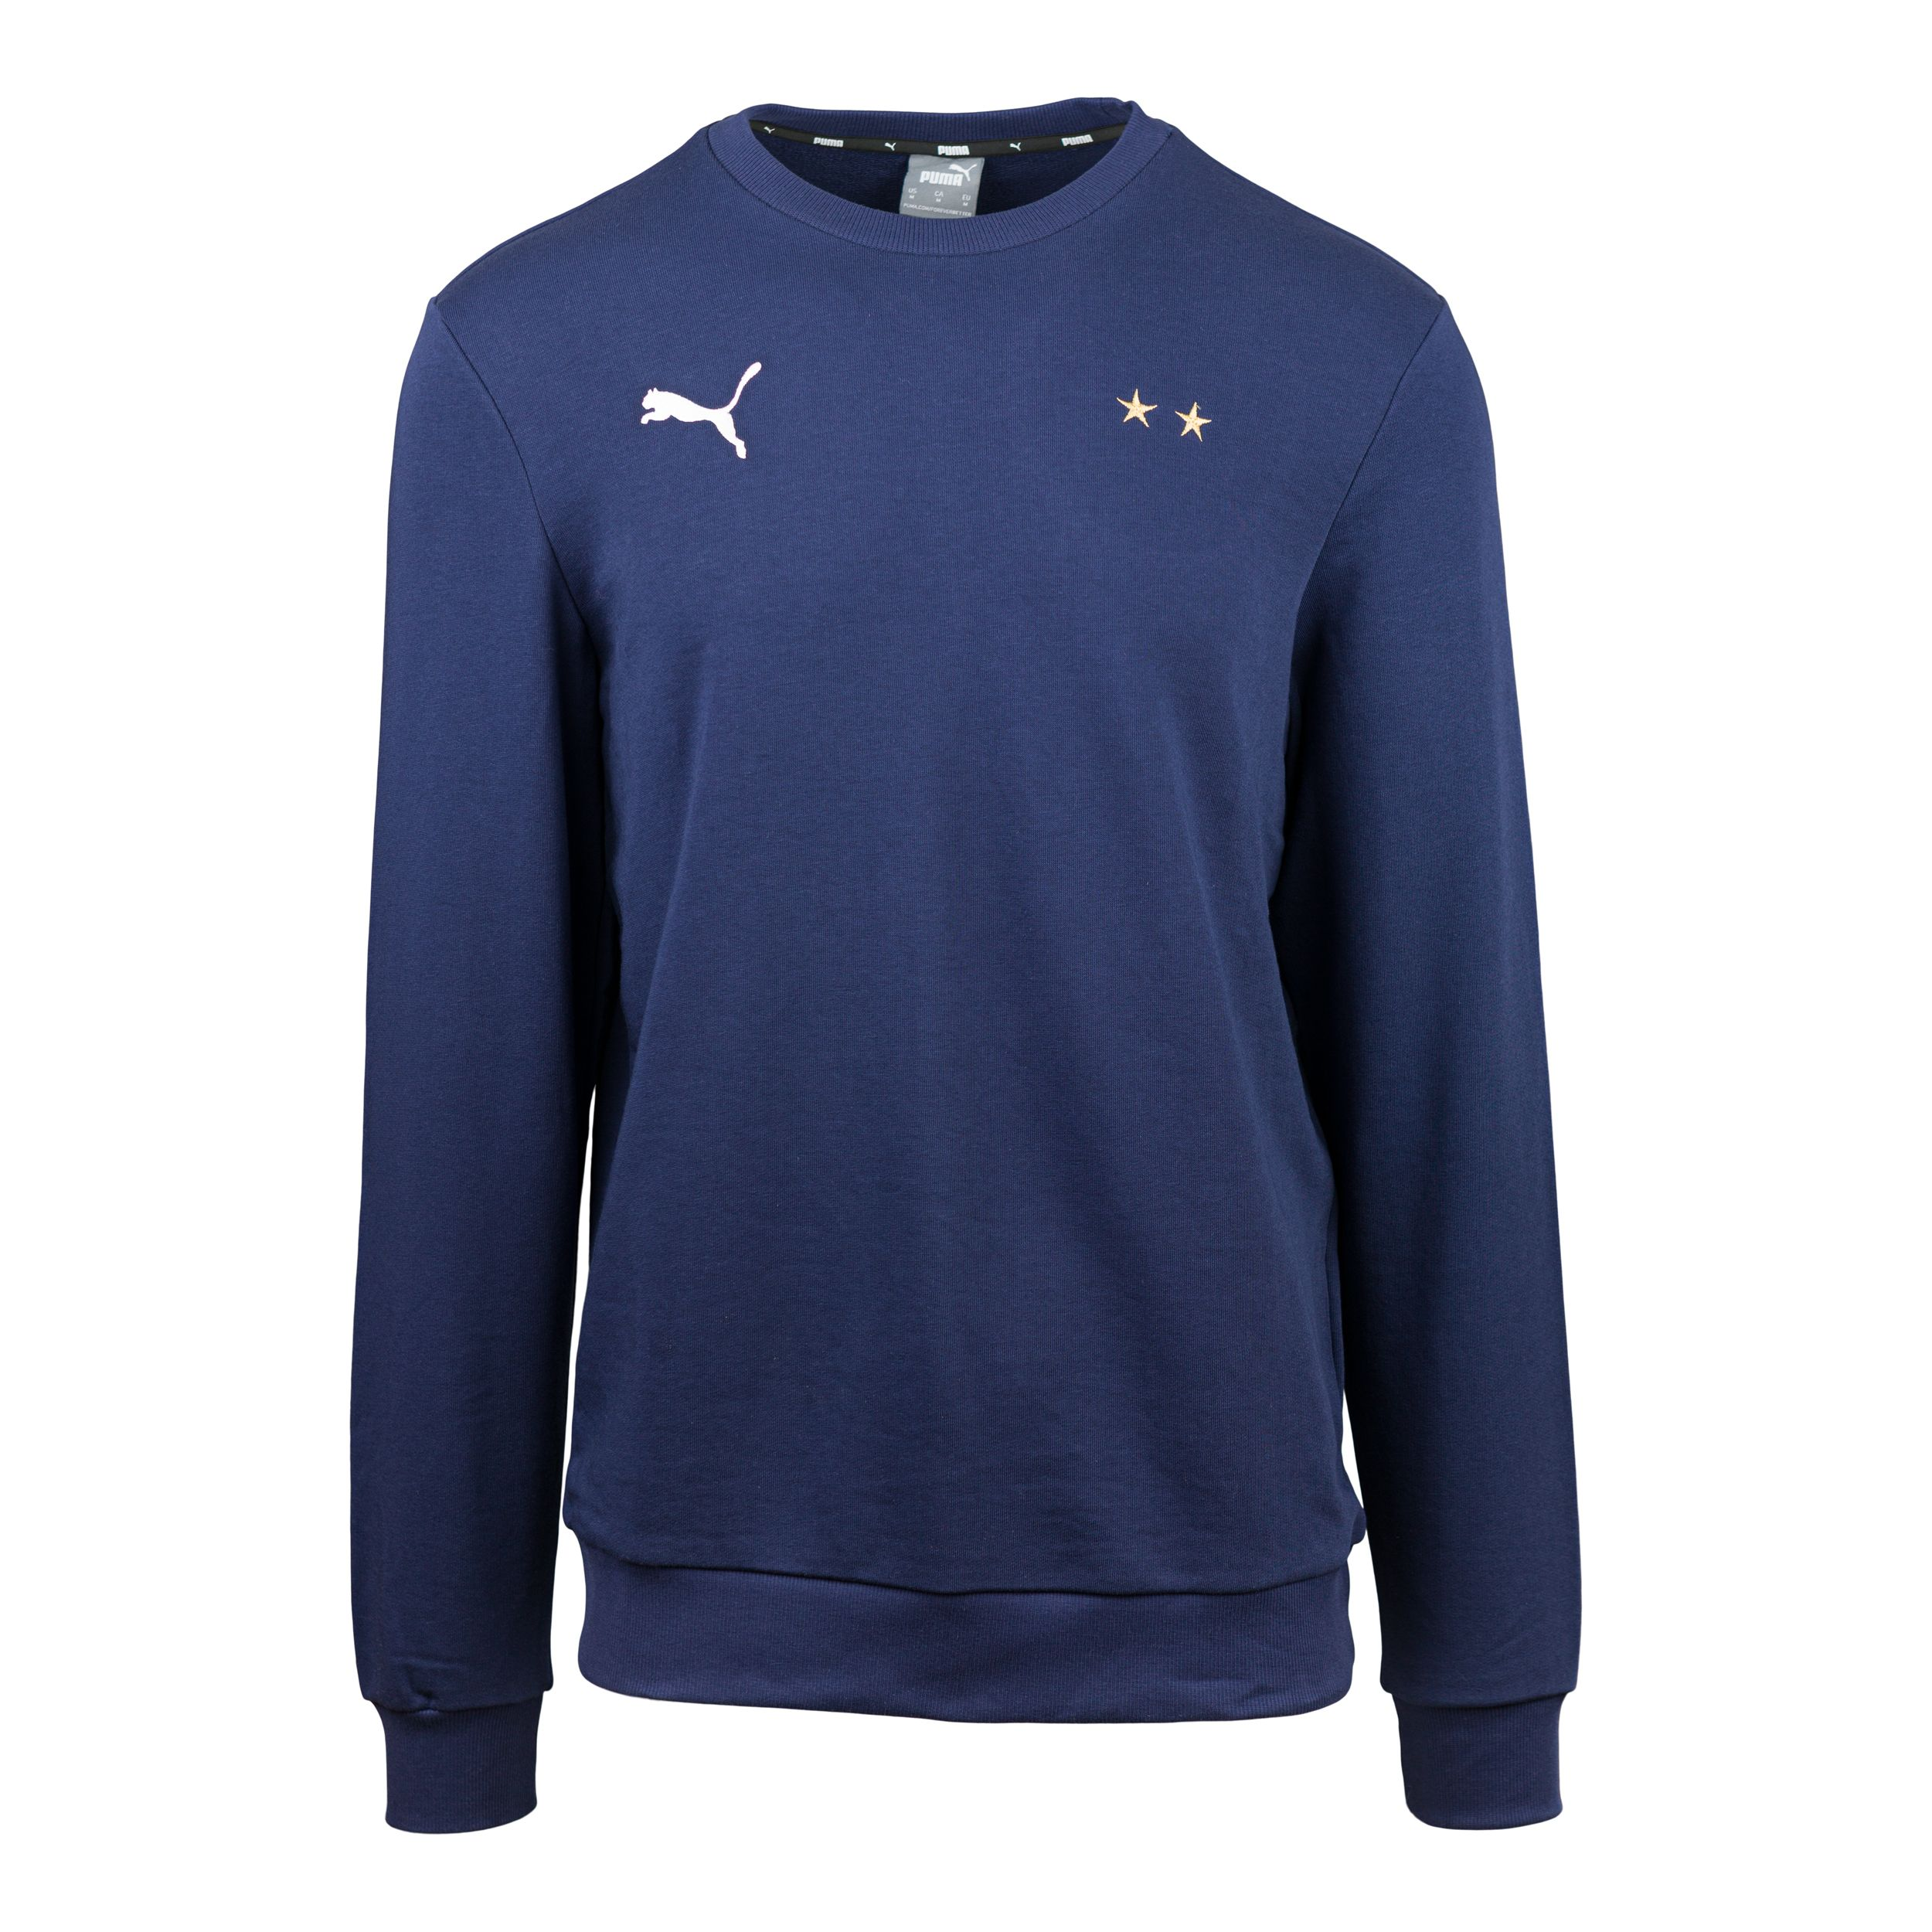 Puma sweatshirt två stjärnor